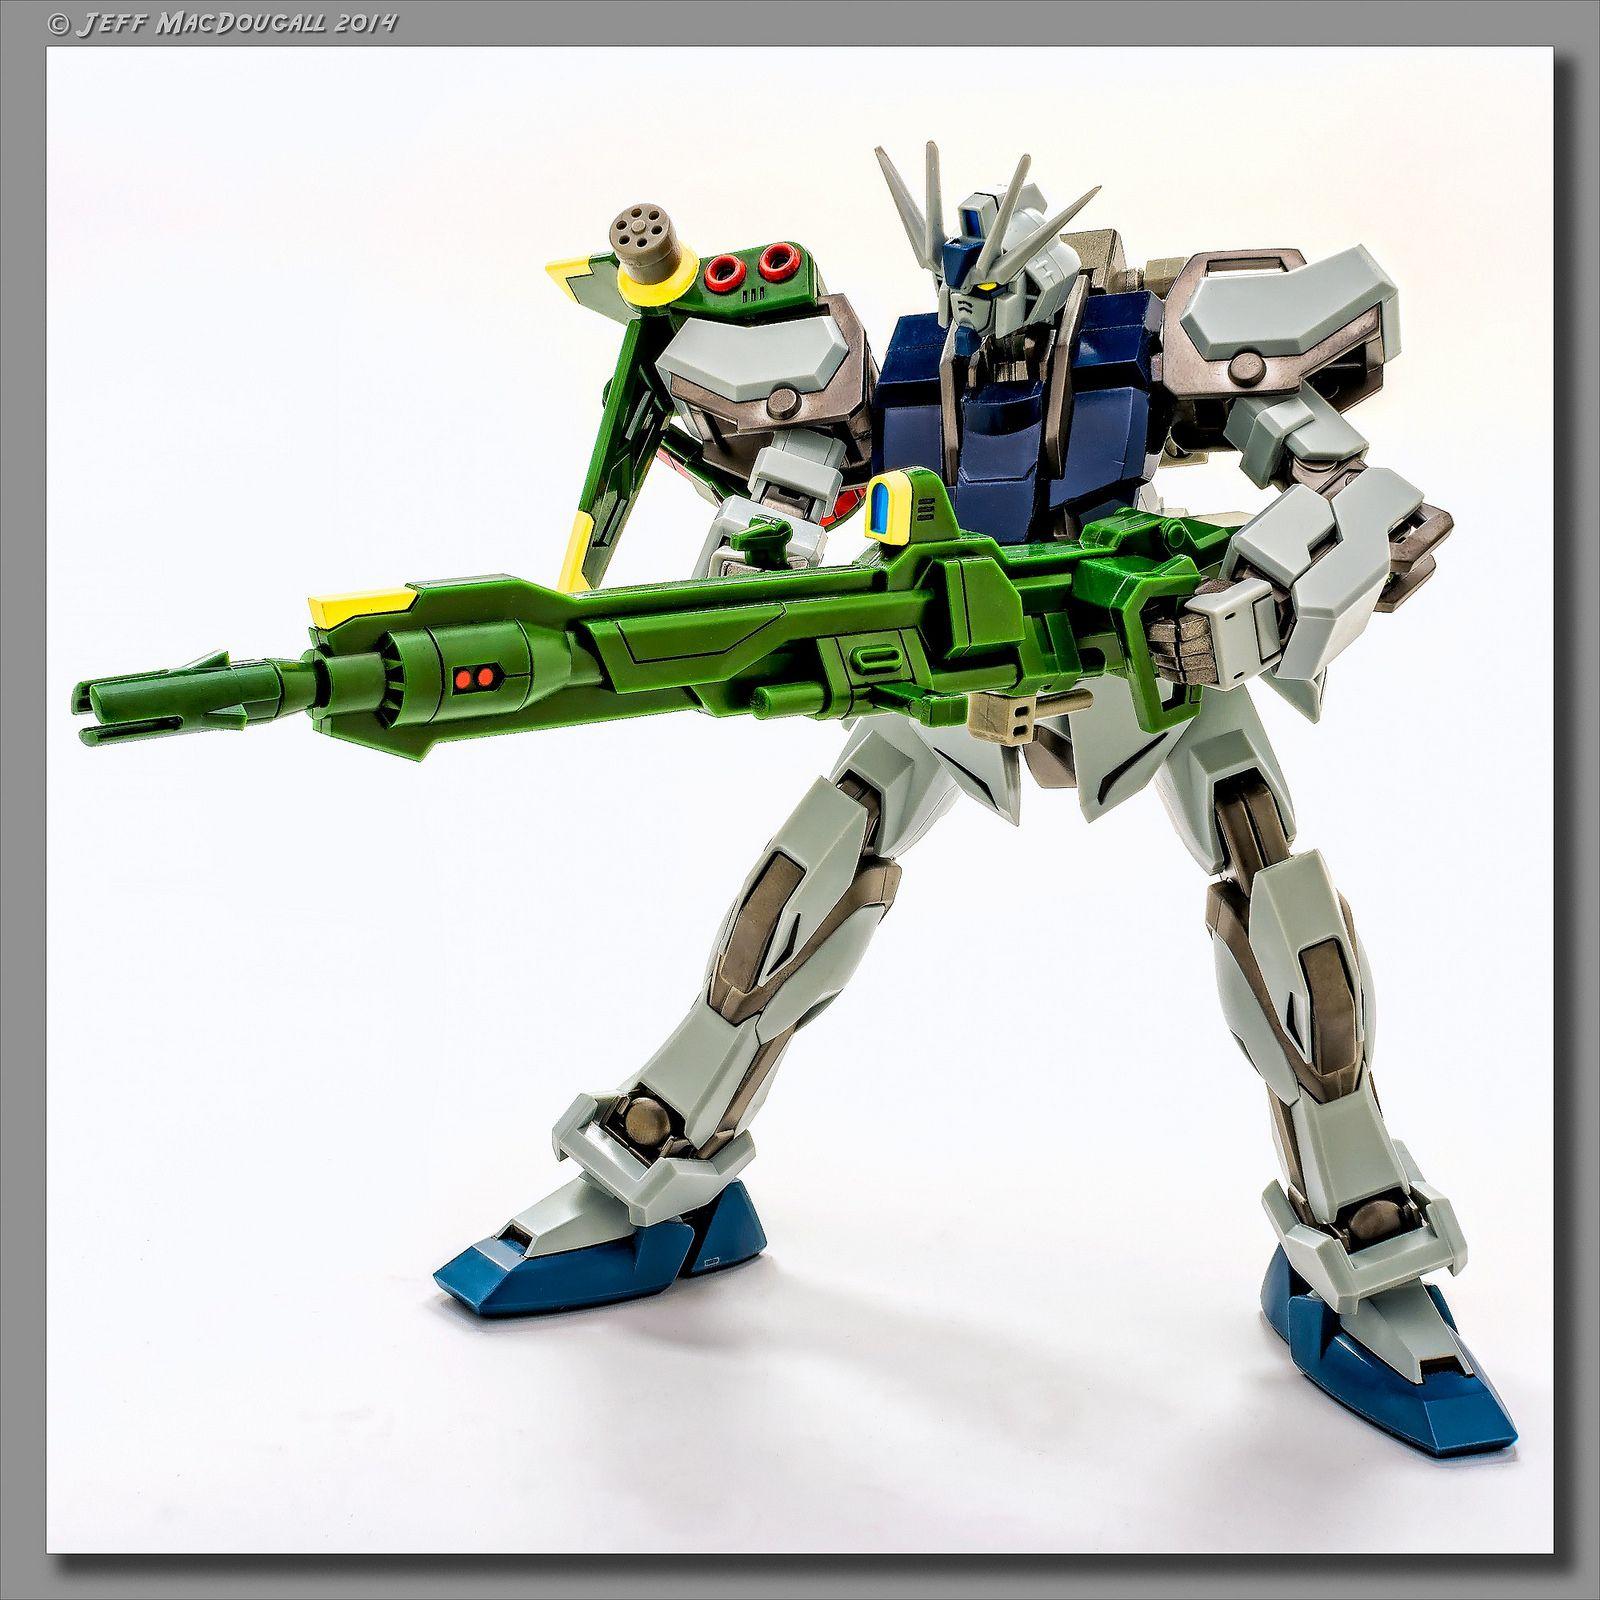 Launcher Strike Gundam Strike gundam, Gundam, Bandai